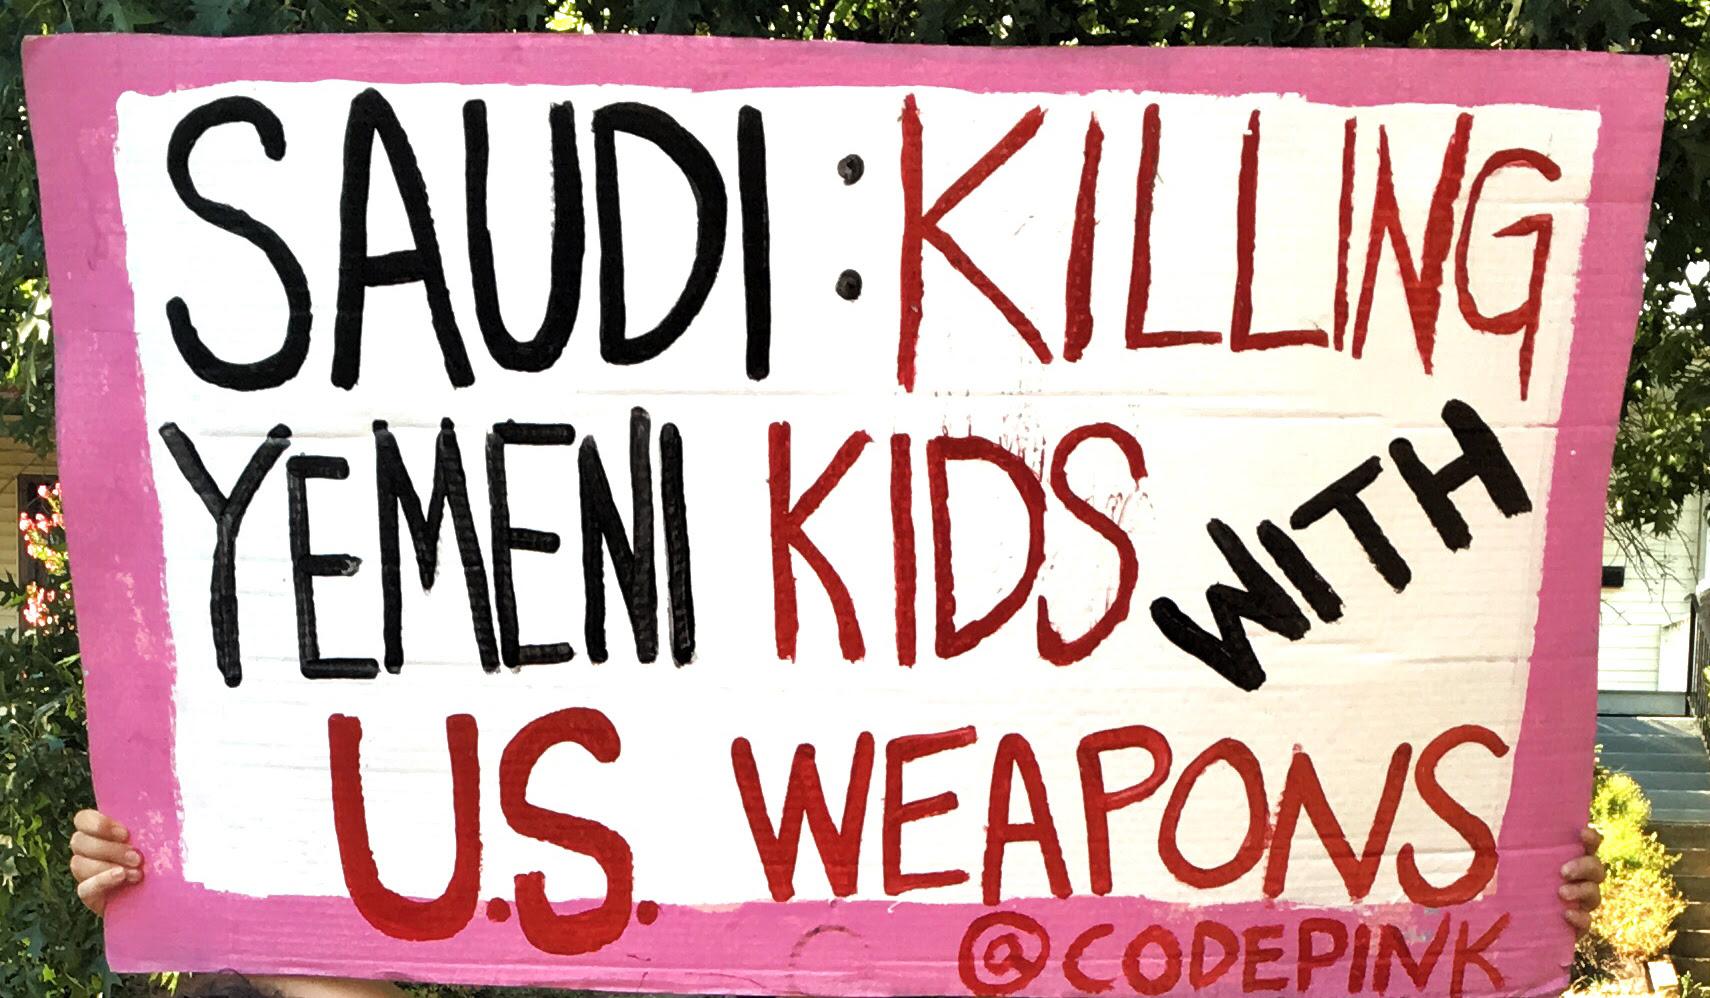 Saudi Killings